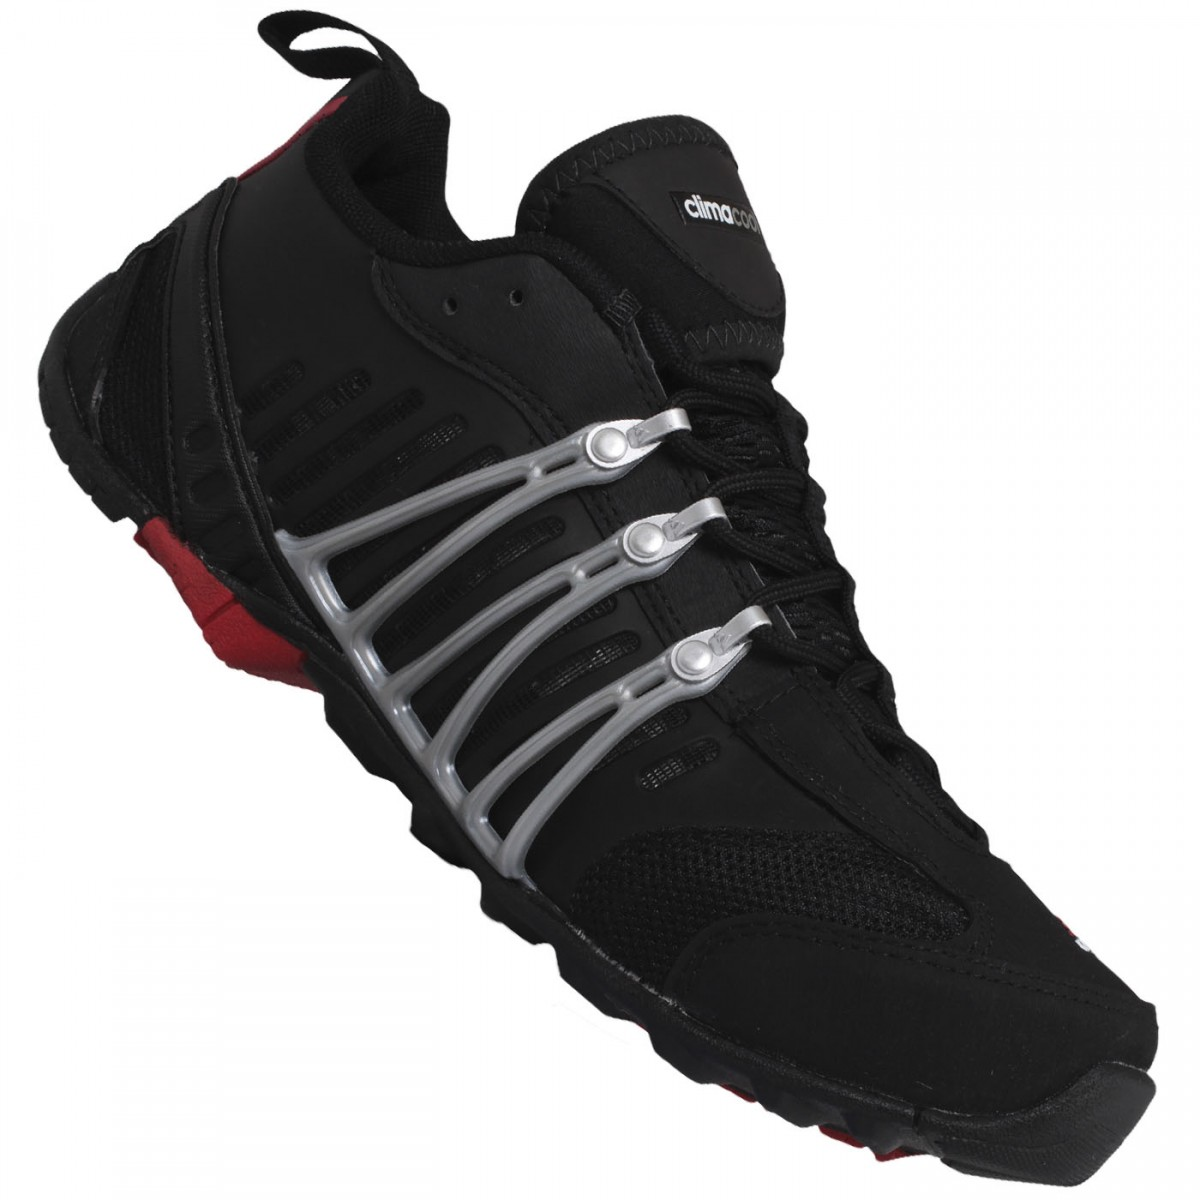 61f341372da Tênis Adidas CC Hellbender ATS